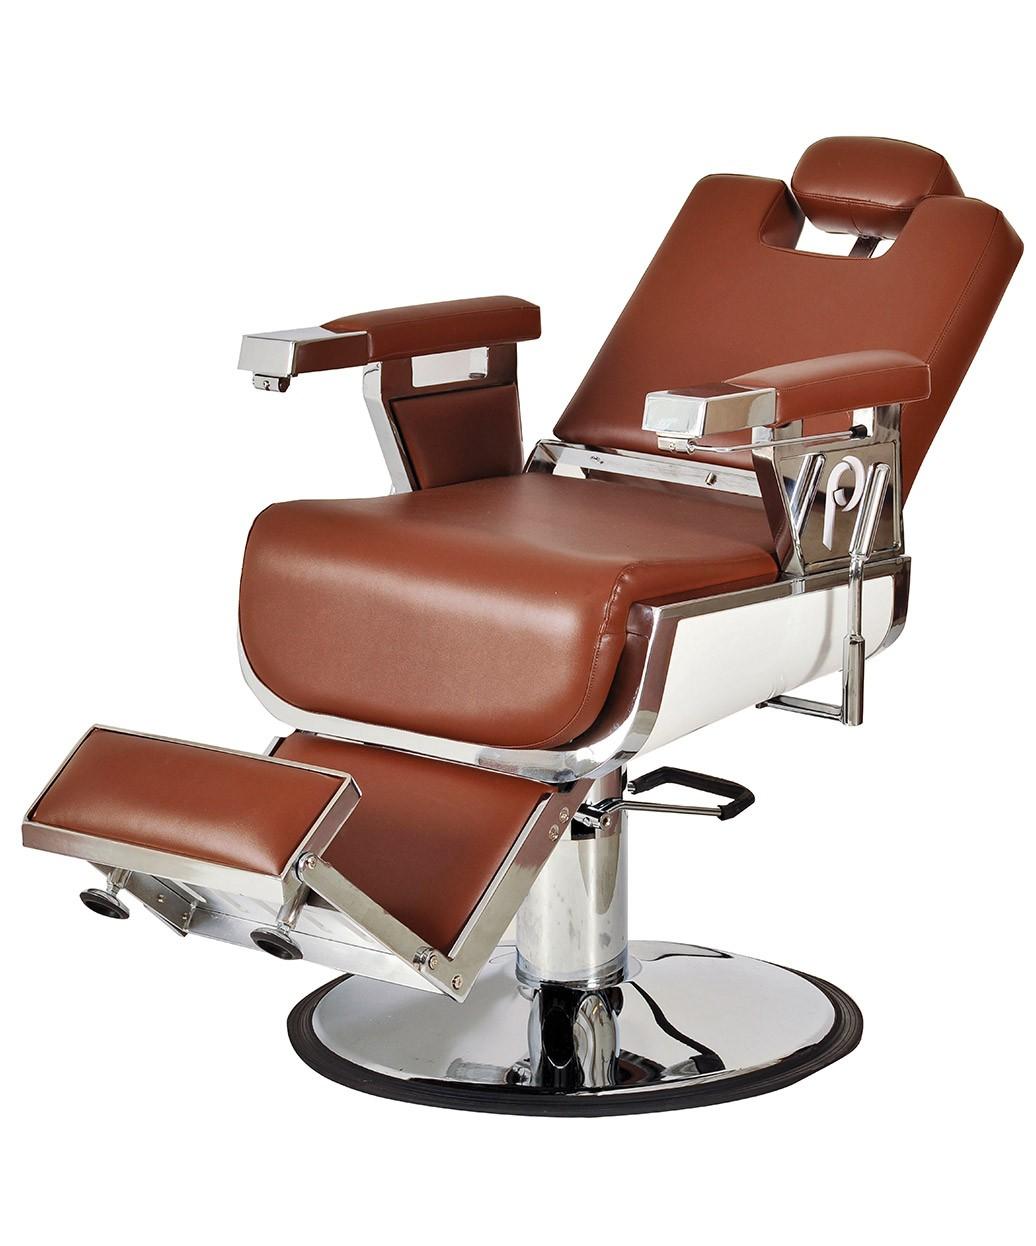 Pibbs Seville Barber Chair Vintage Heavy Duty Barber Chair